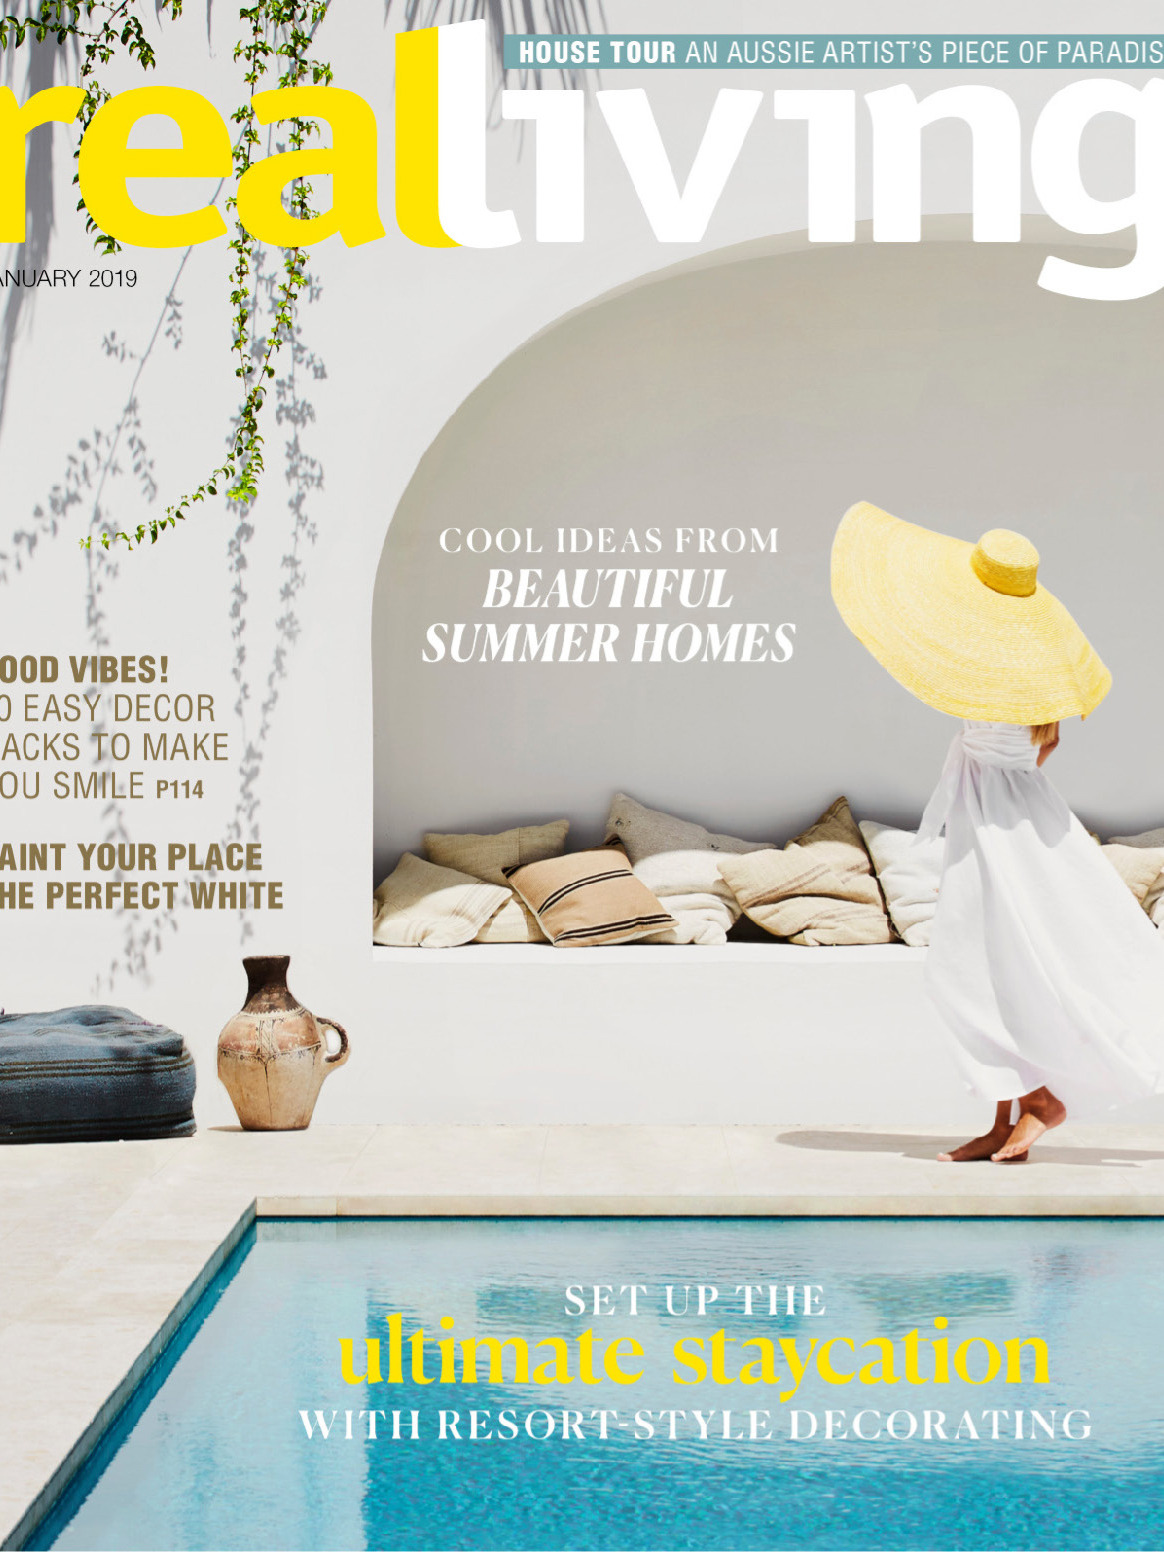 《Real Living》澳大利亚室内设计趋势杂志2019年01月号